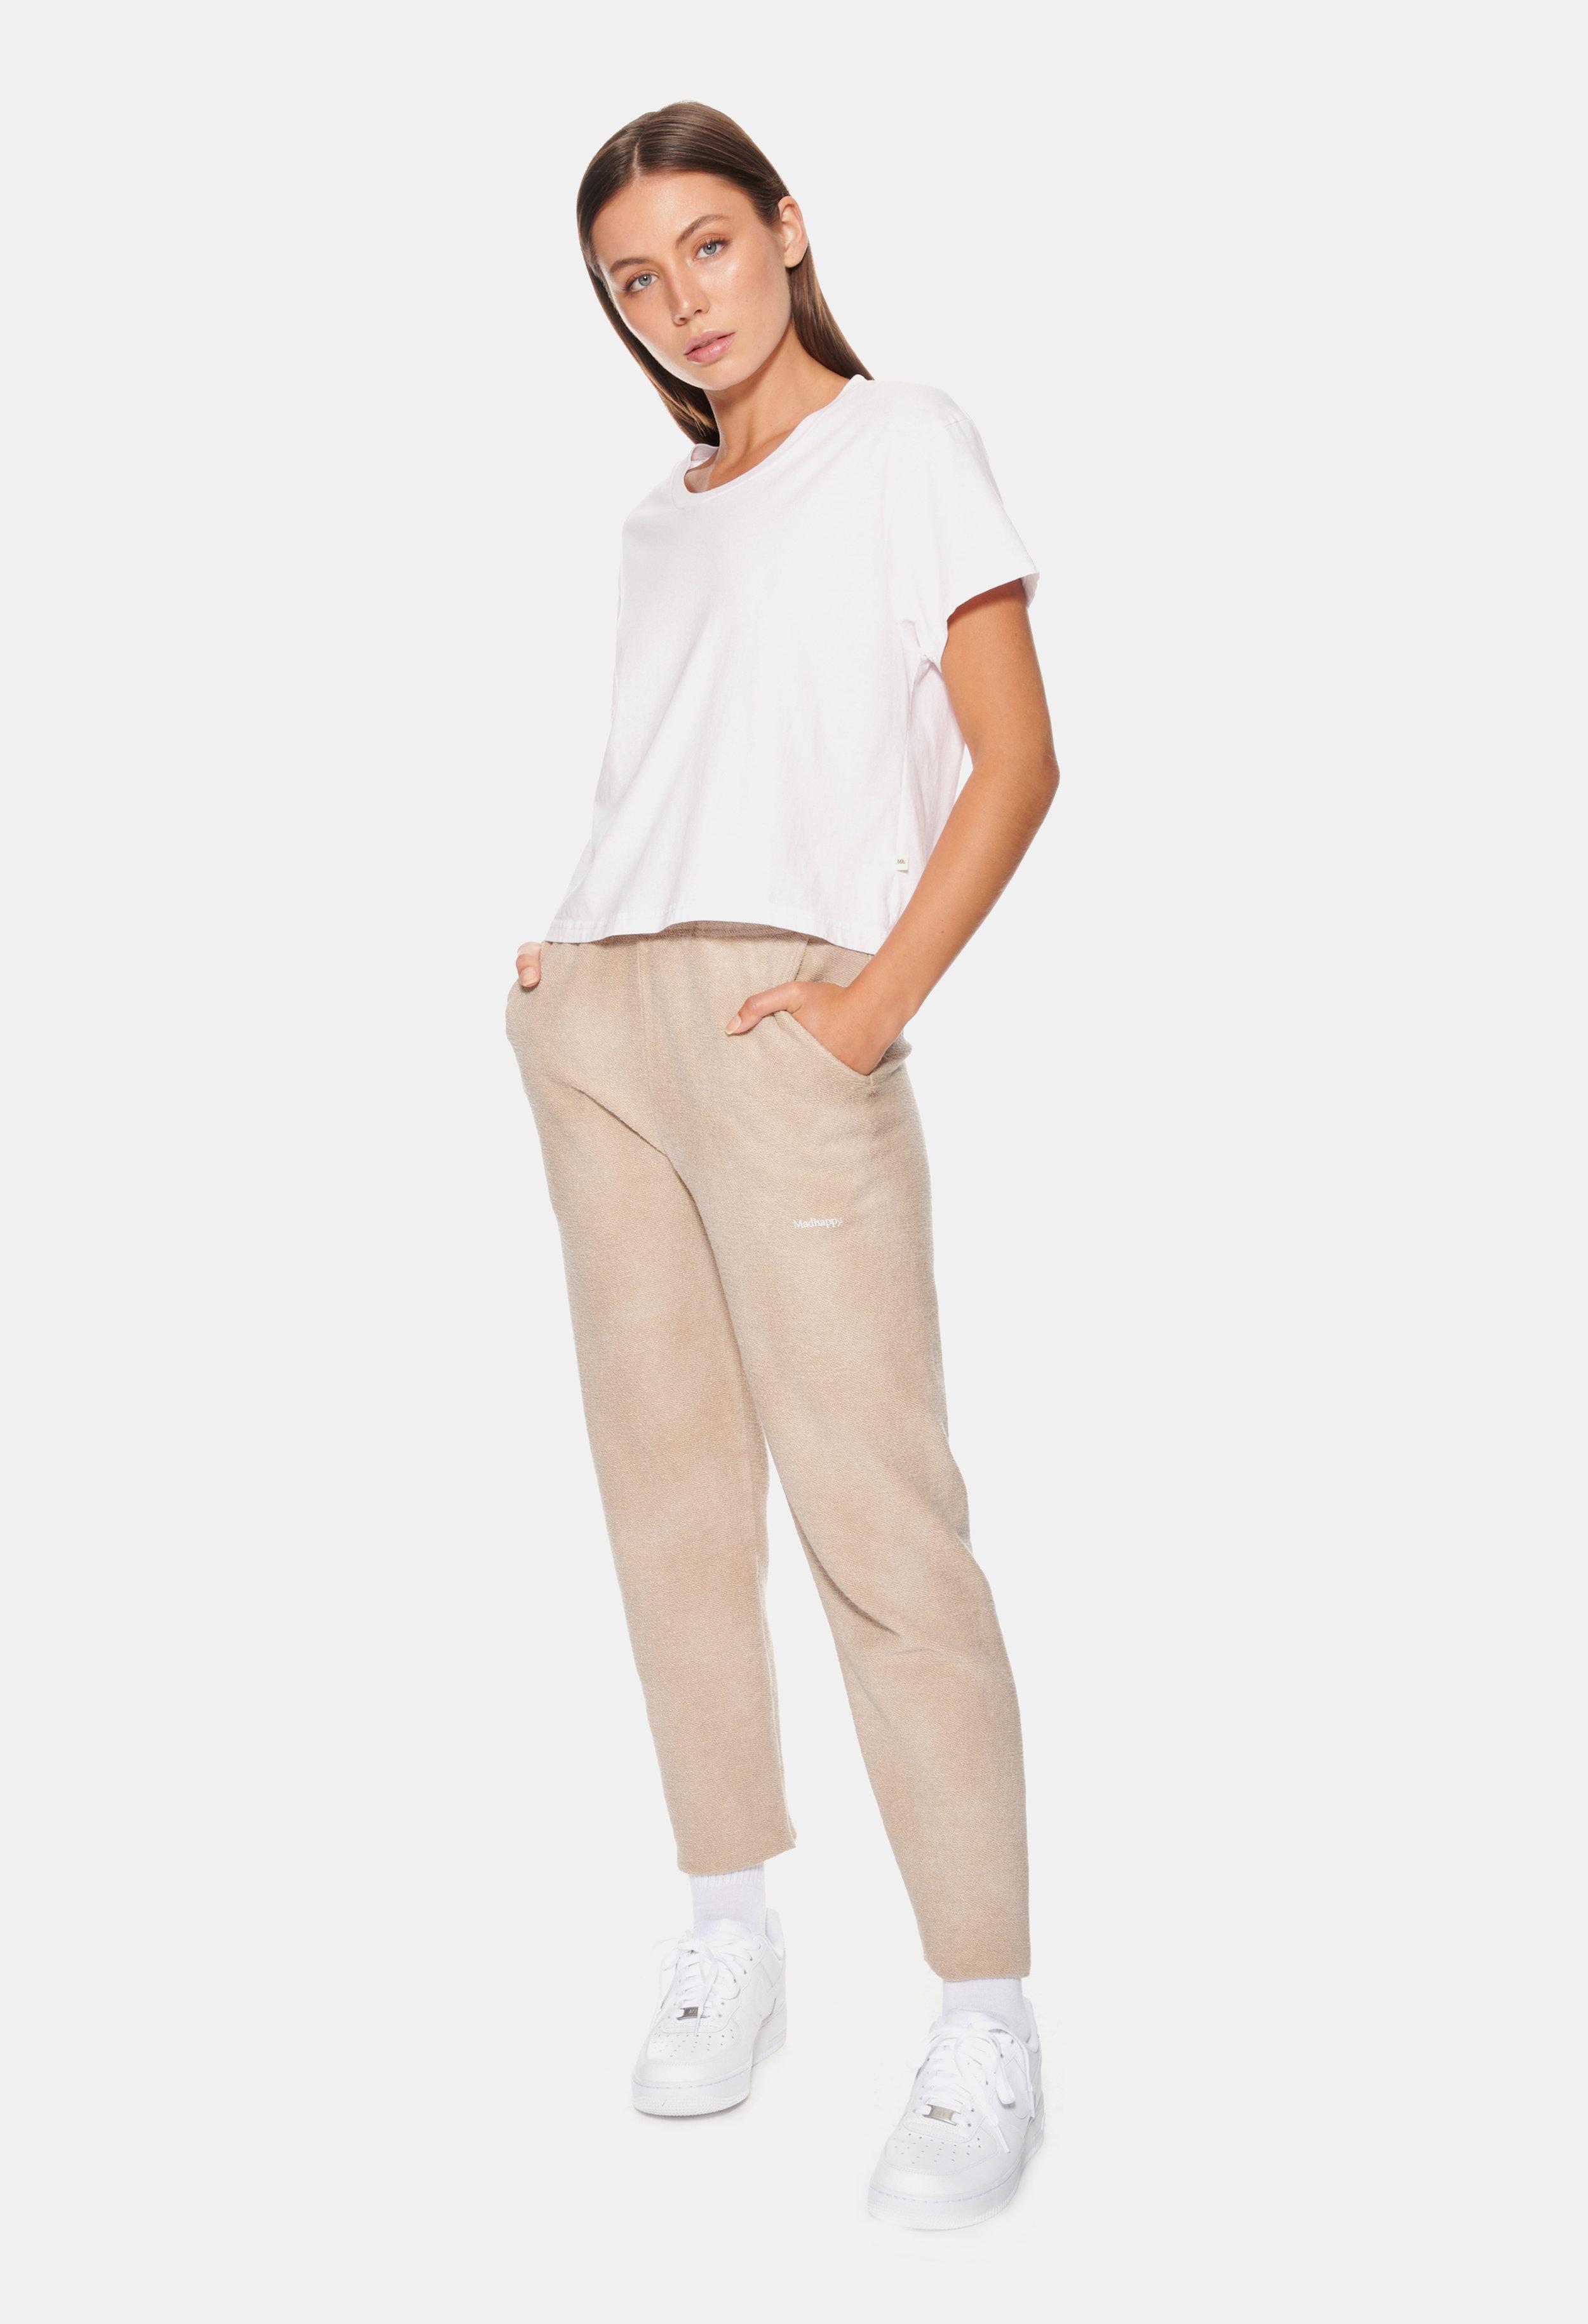 September Classics-Universal Sweatpant-Model Shot-Female-04.jpg